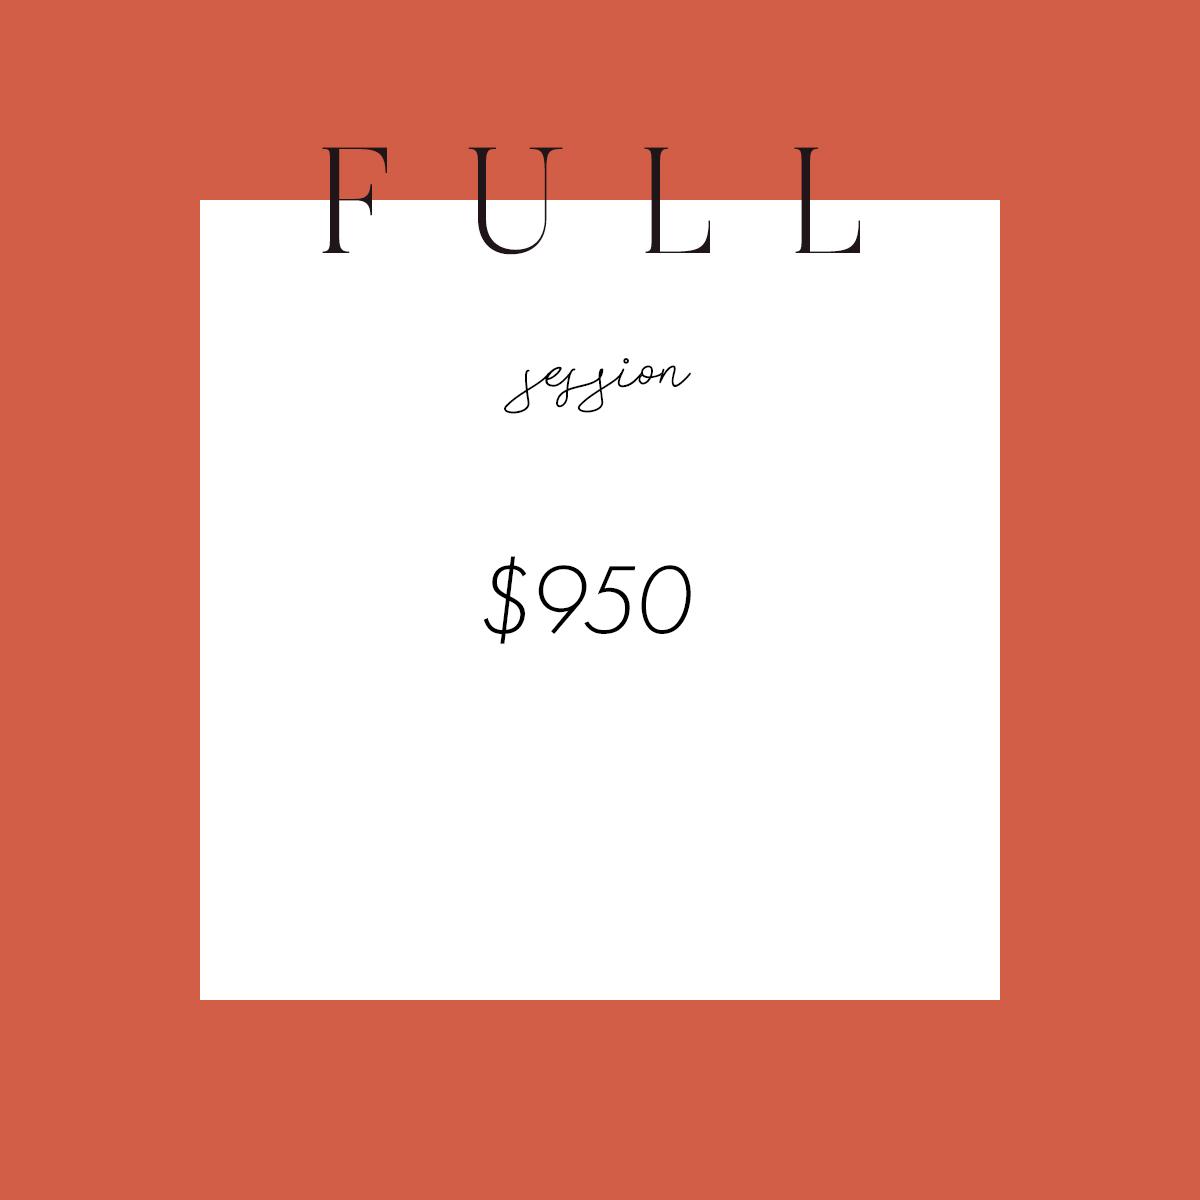 Fullsession-price-picture.jpg